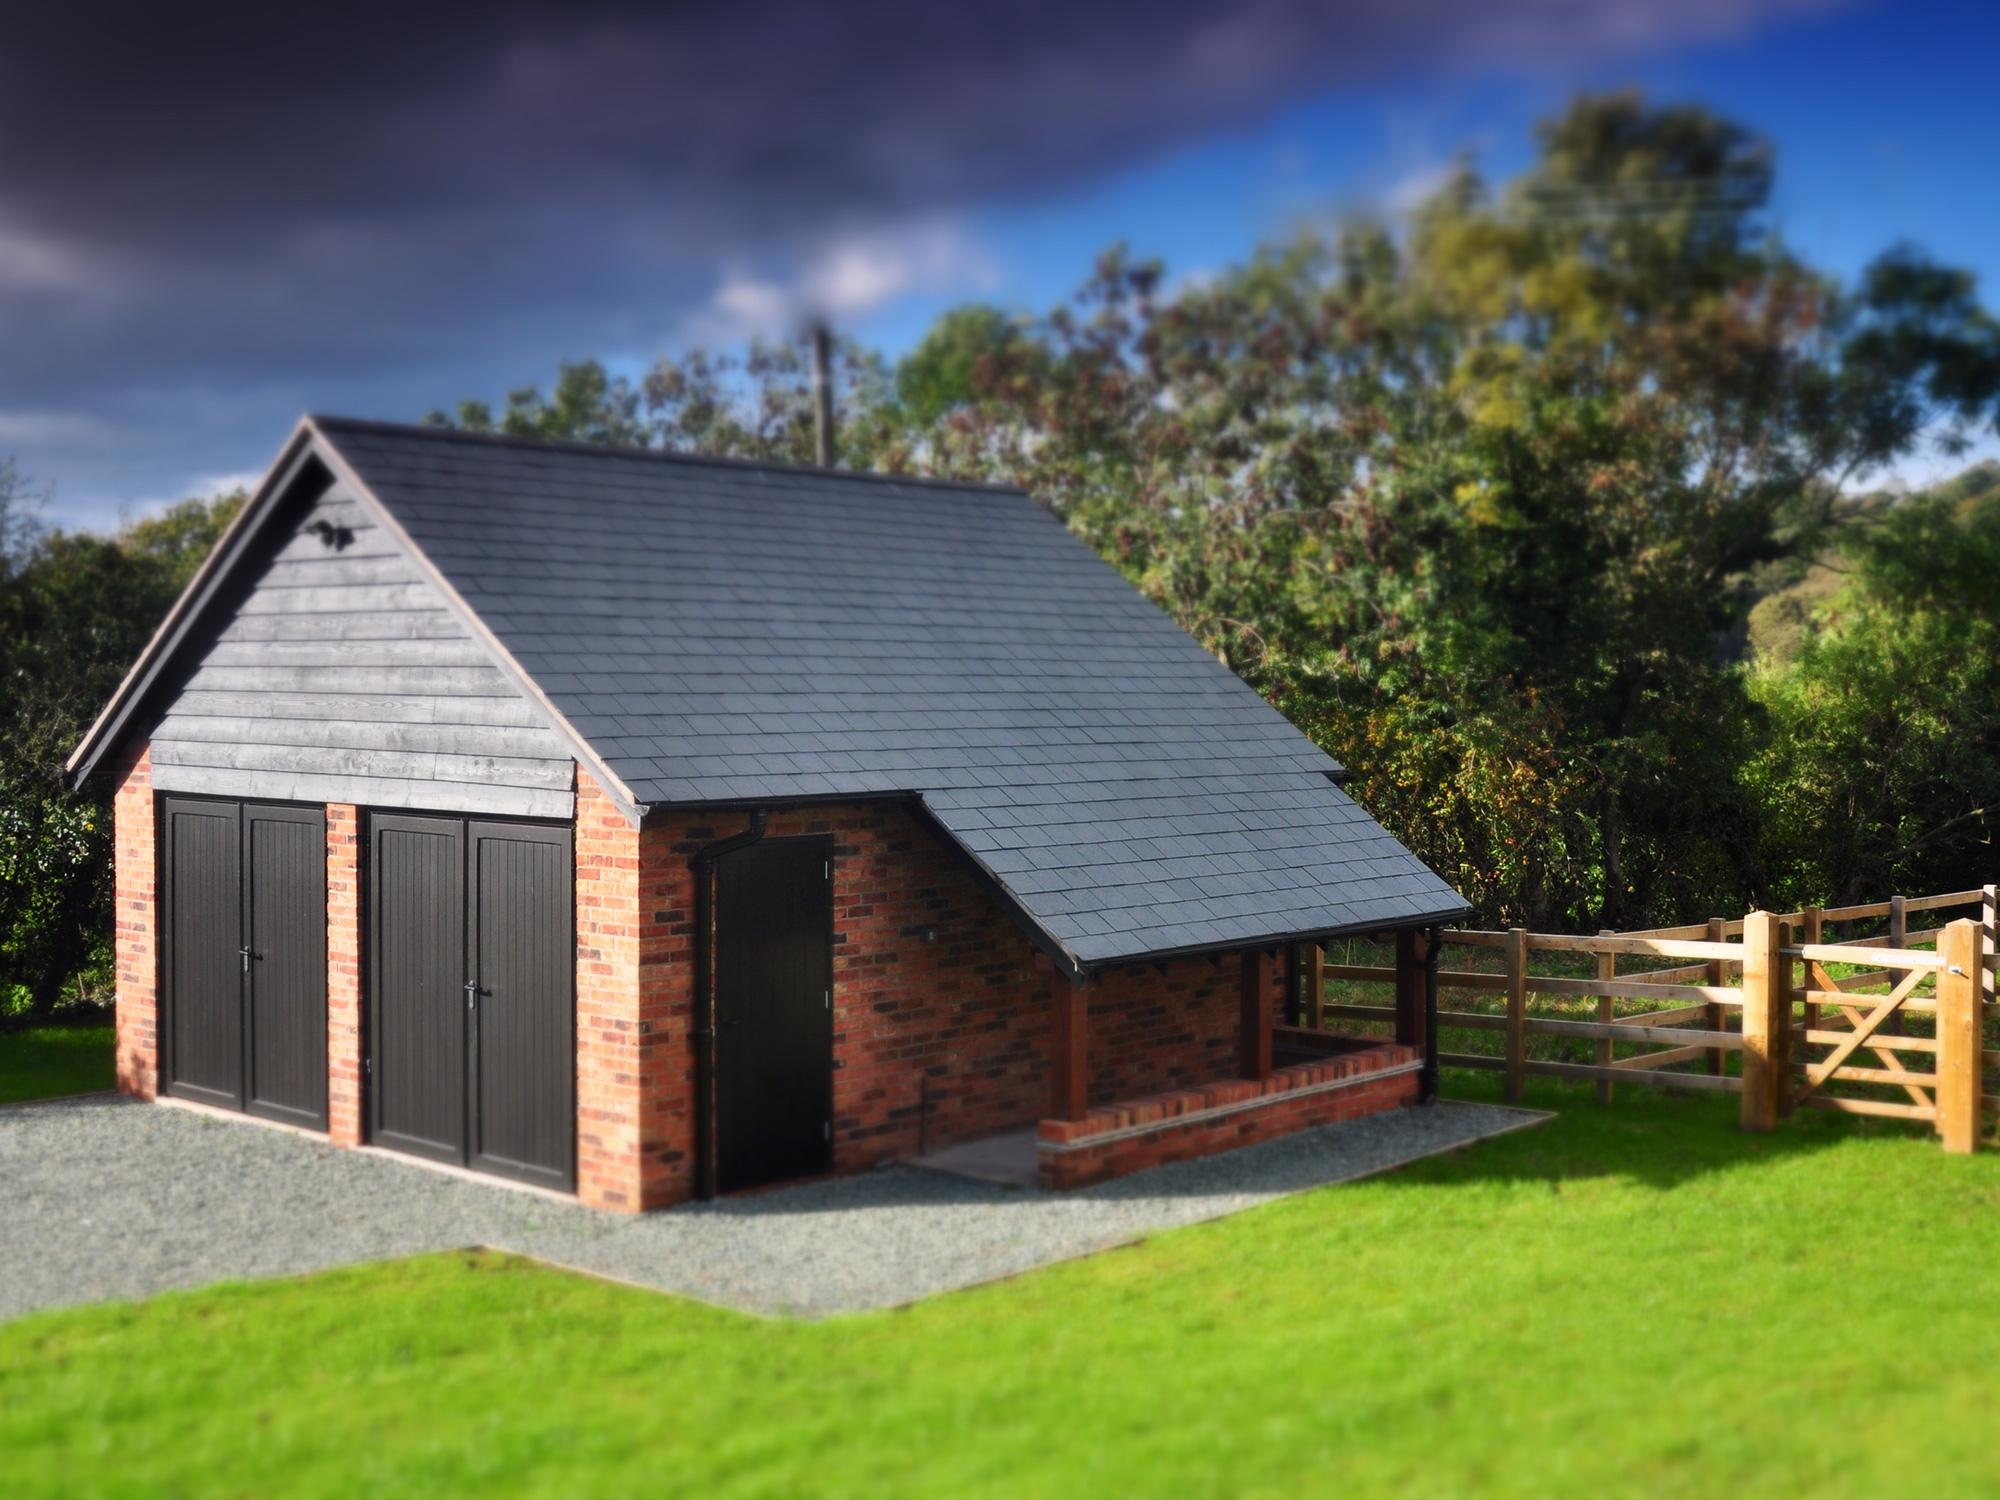 Kenstone barns hawkstone luxury barn conversions by for Luxury barn homes